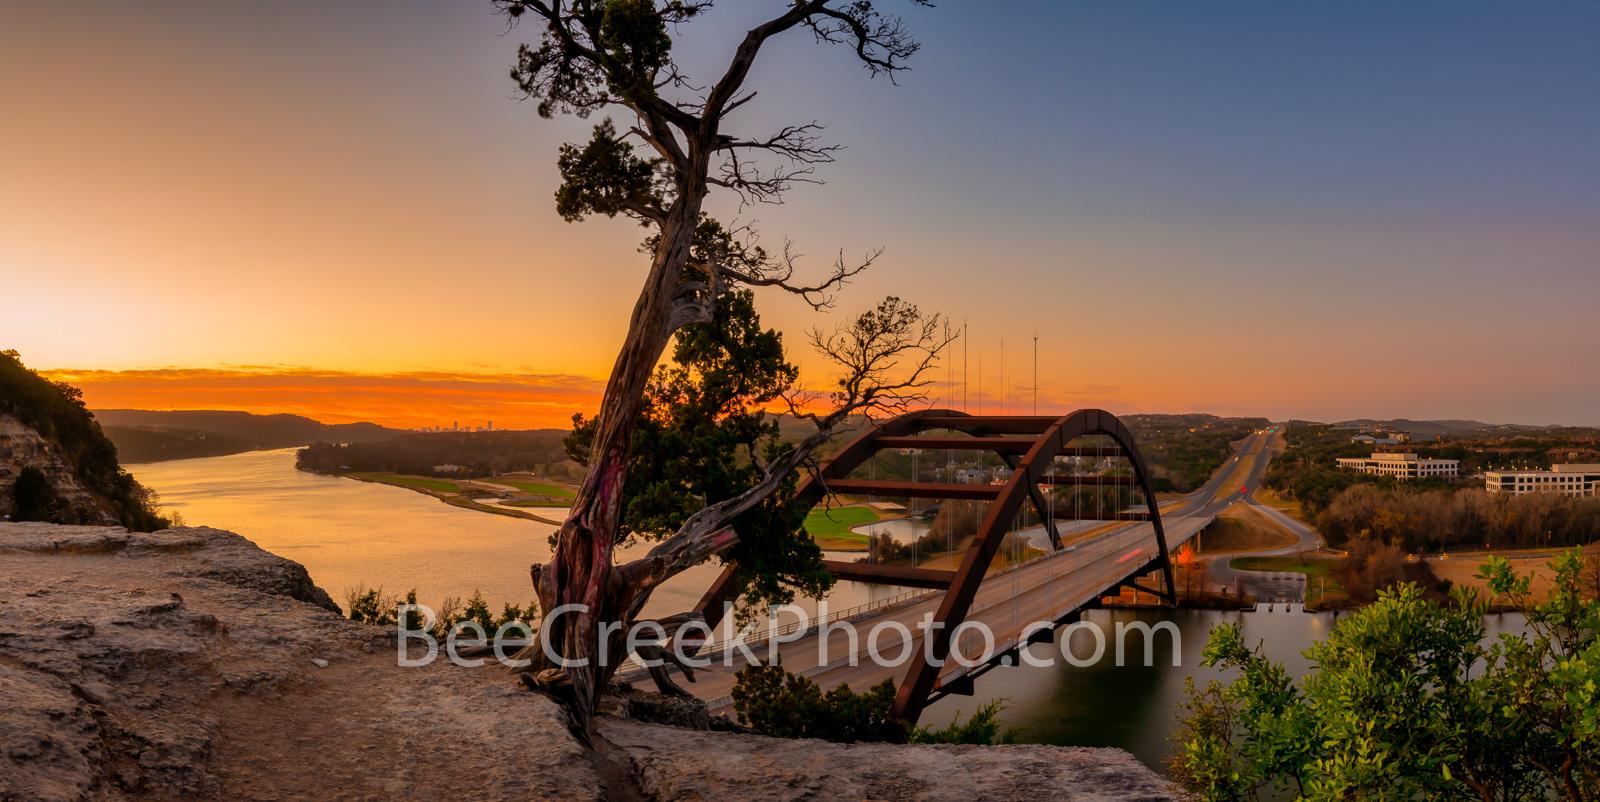 Texas,  Austin 360 Bridge,  Austin texas, pano, panorama, Pennybacker Bridge, Lake Austin, austin skyline, downtown austin, city of austin, pictures of austin, , photo